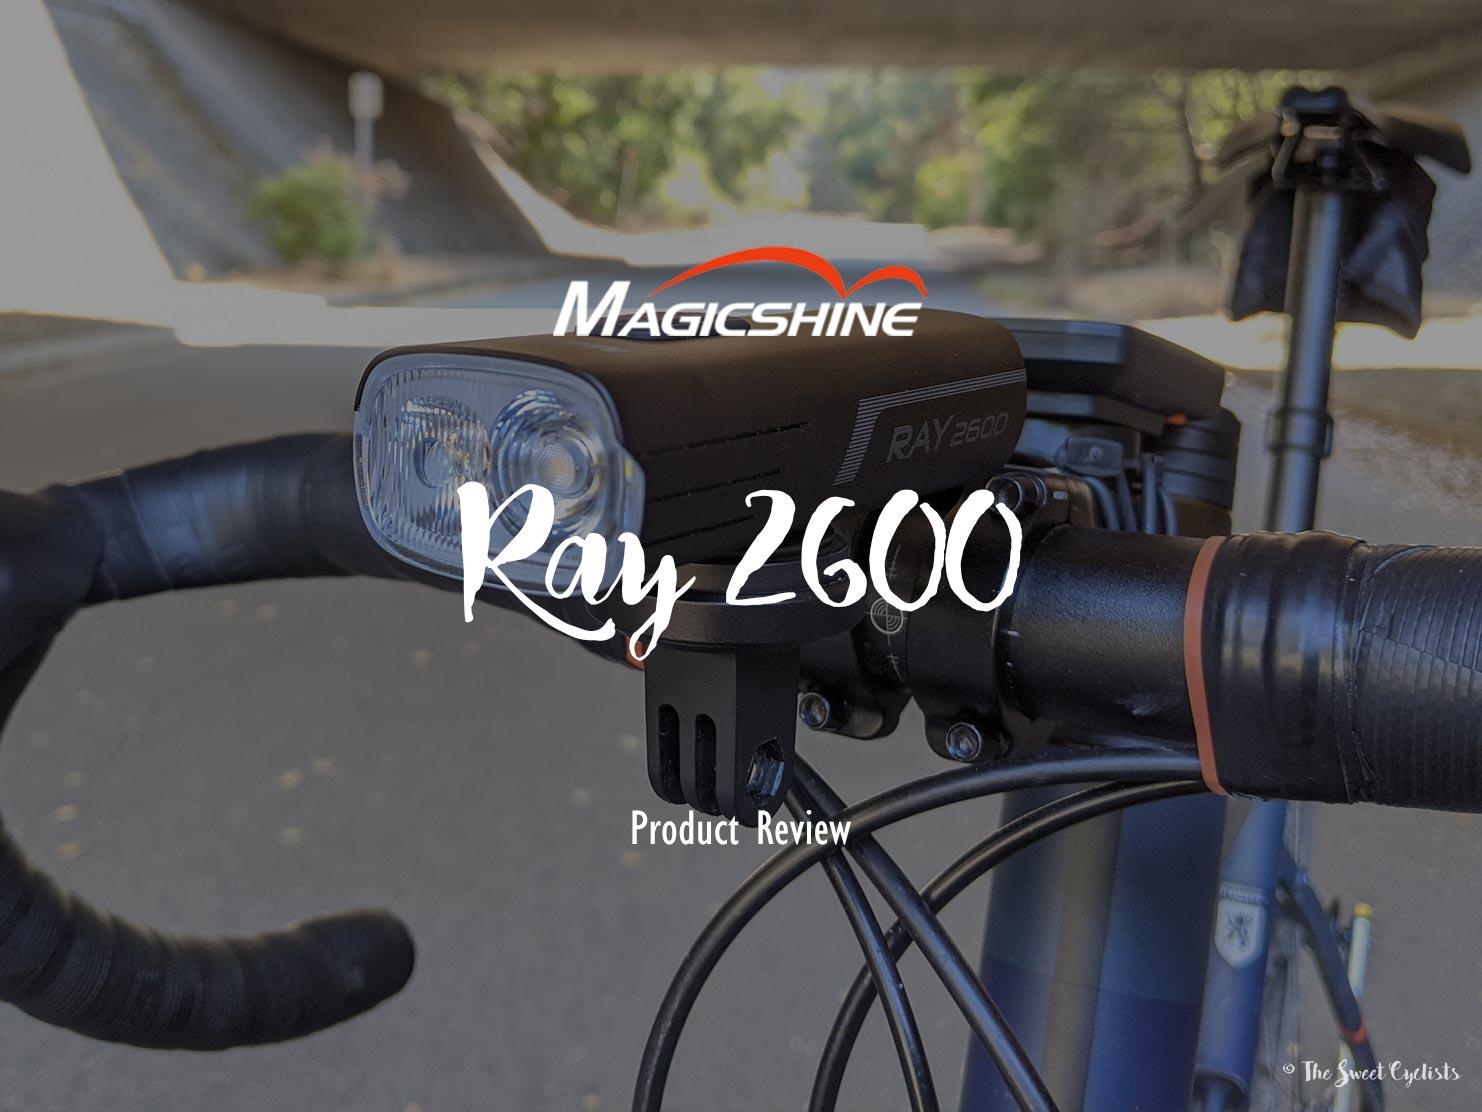 Magicshine's smartest bike headlight